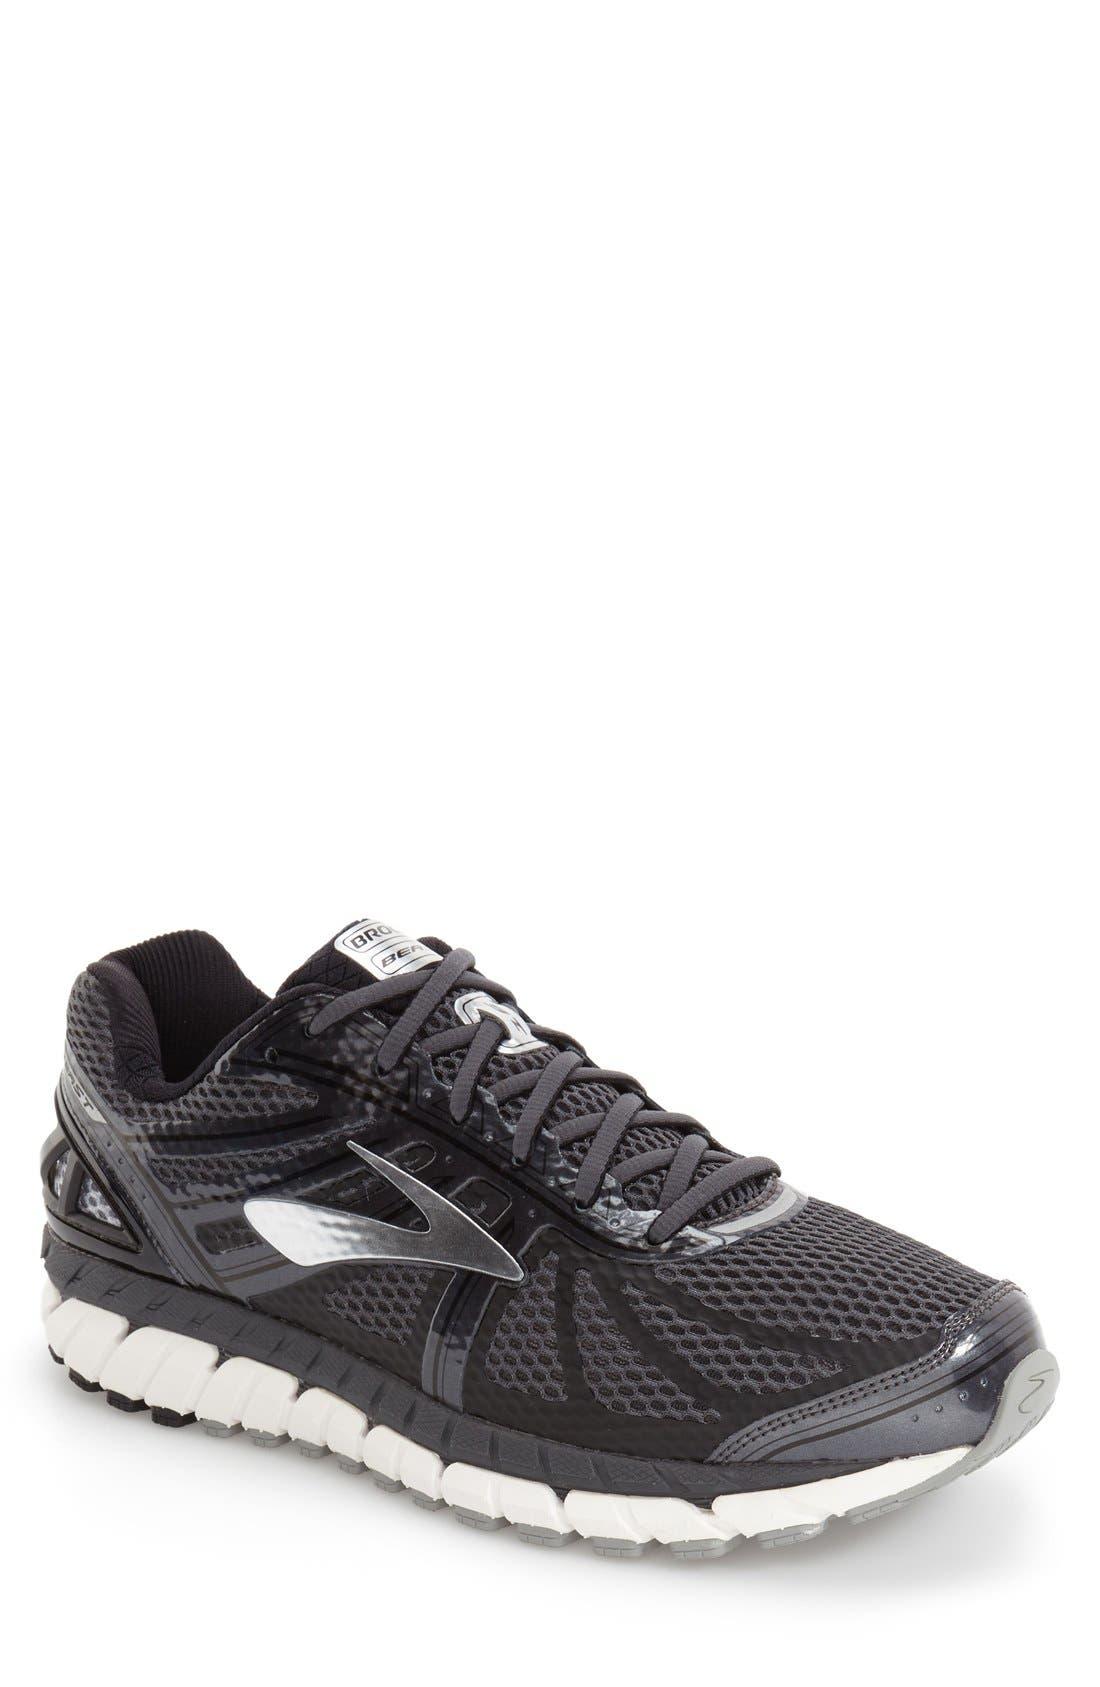 'Beast 16' Running Shoe,                         Main,                         color,